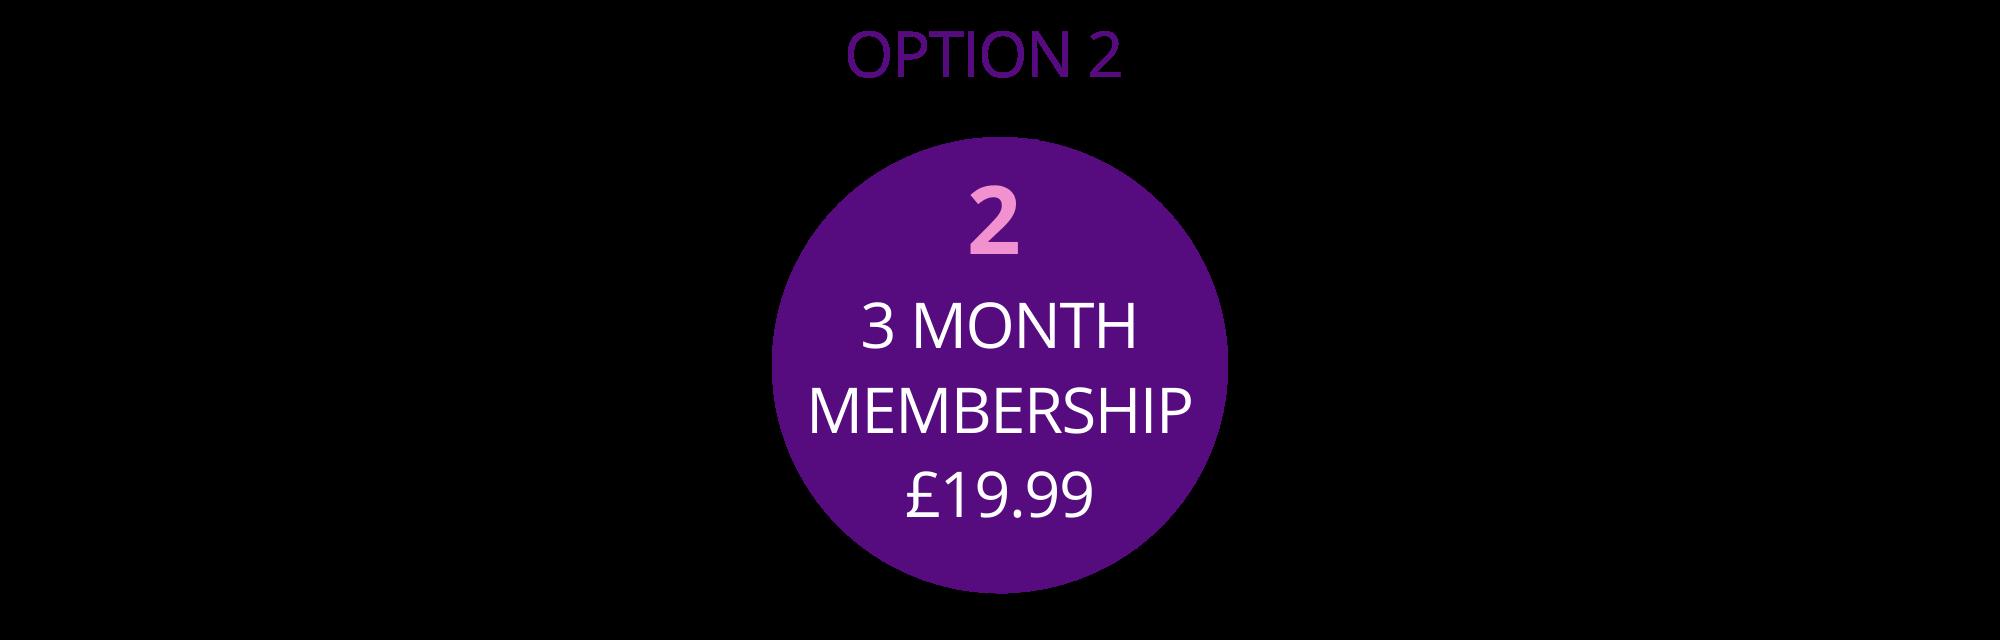 Bandboozled Membership Option 2